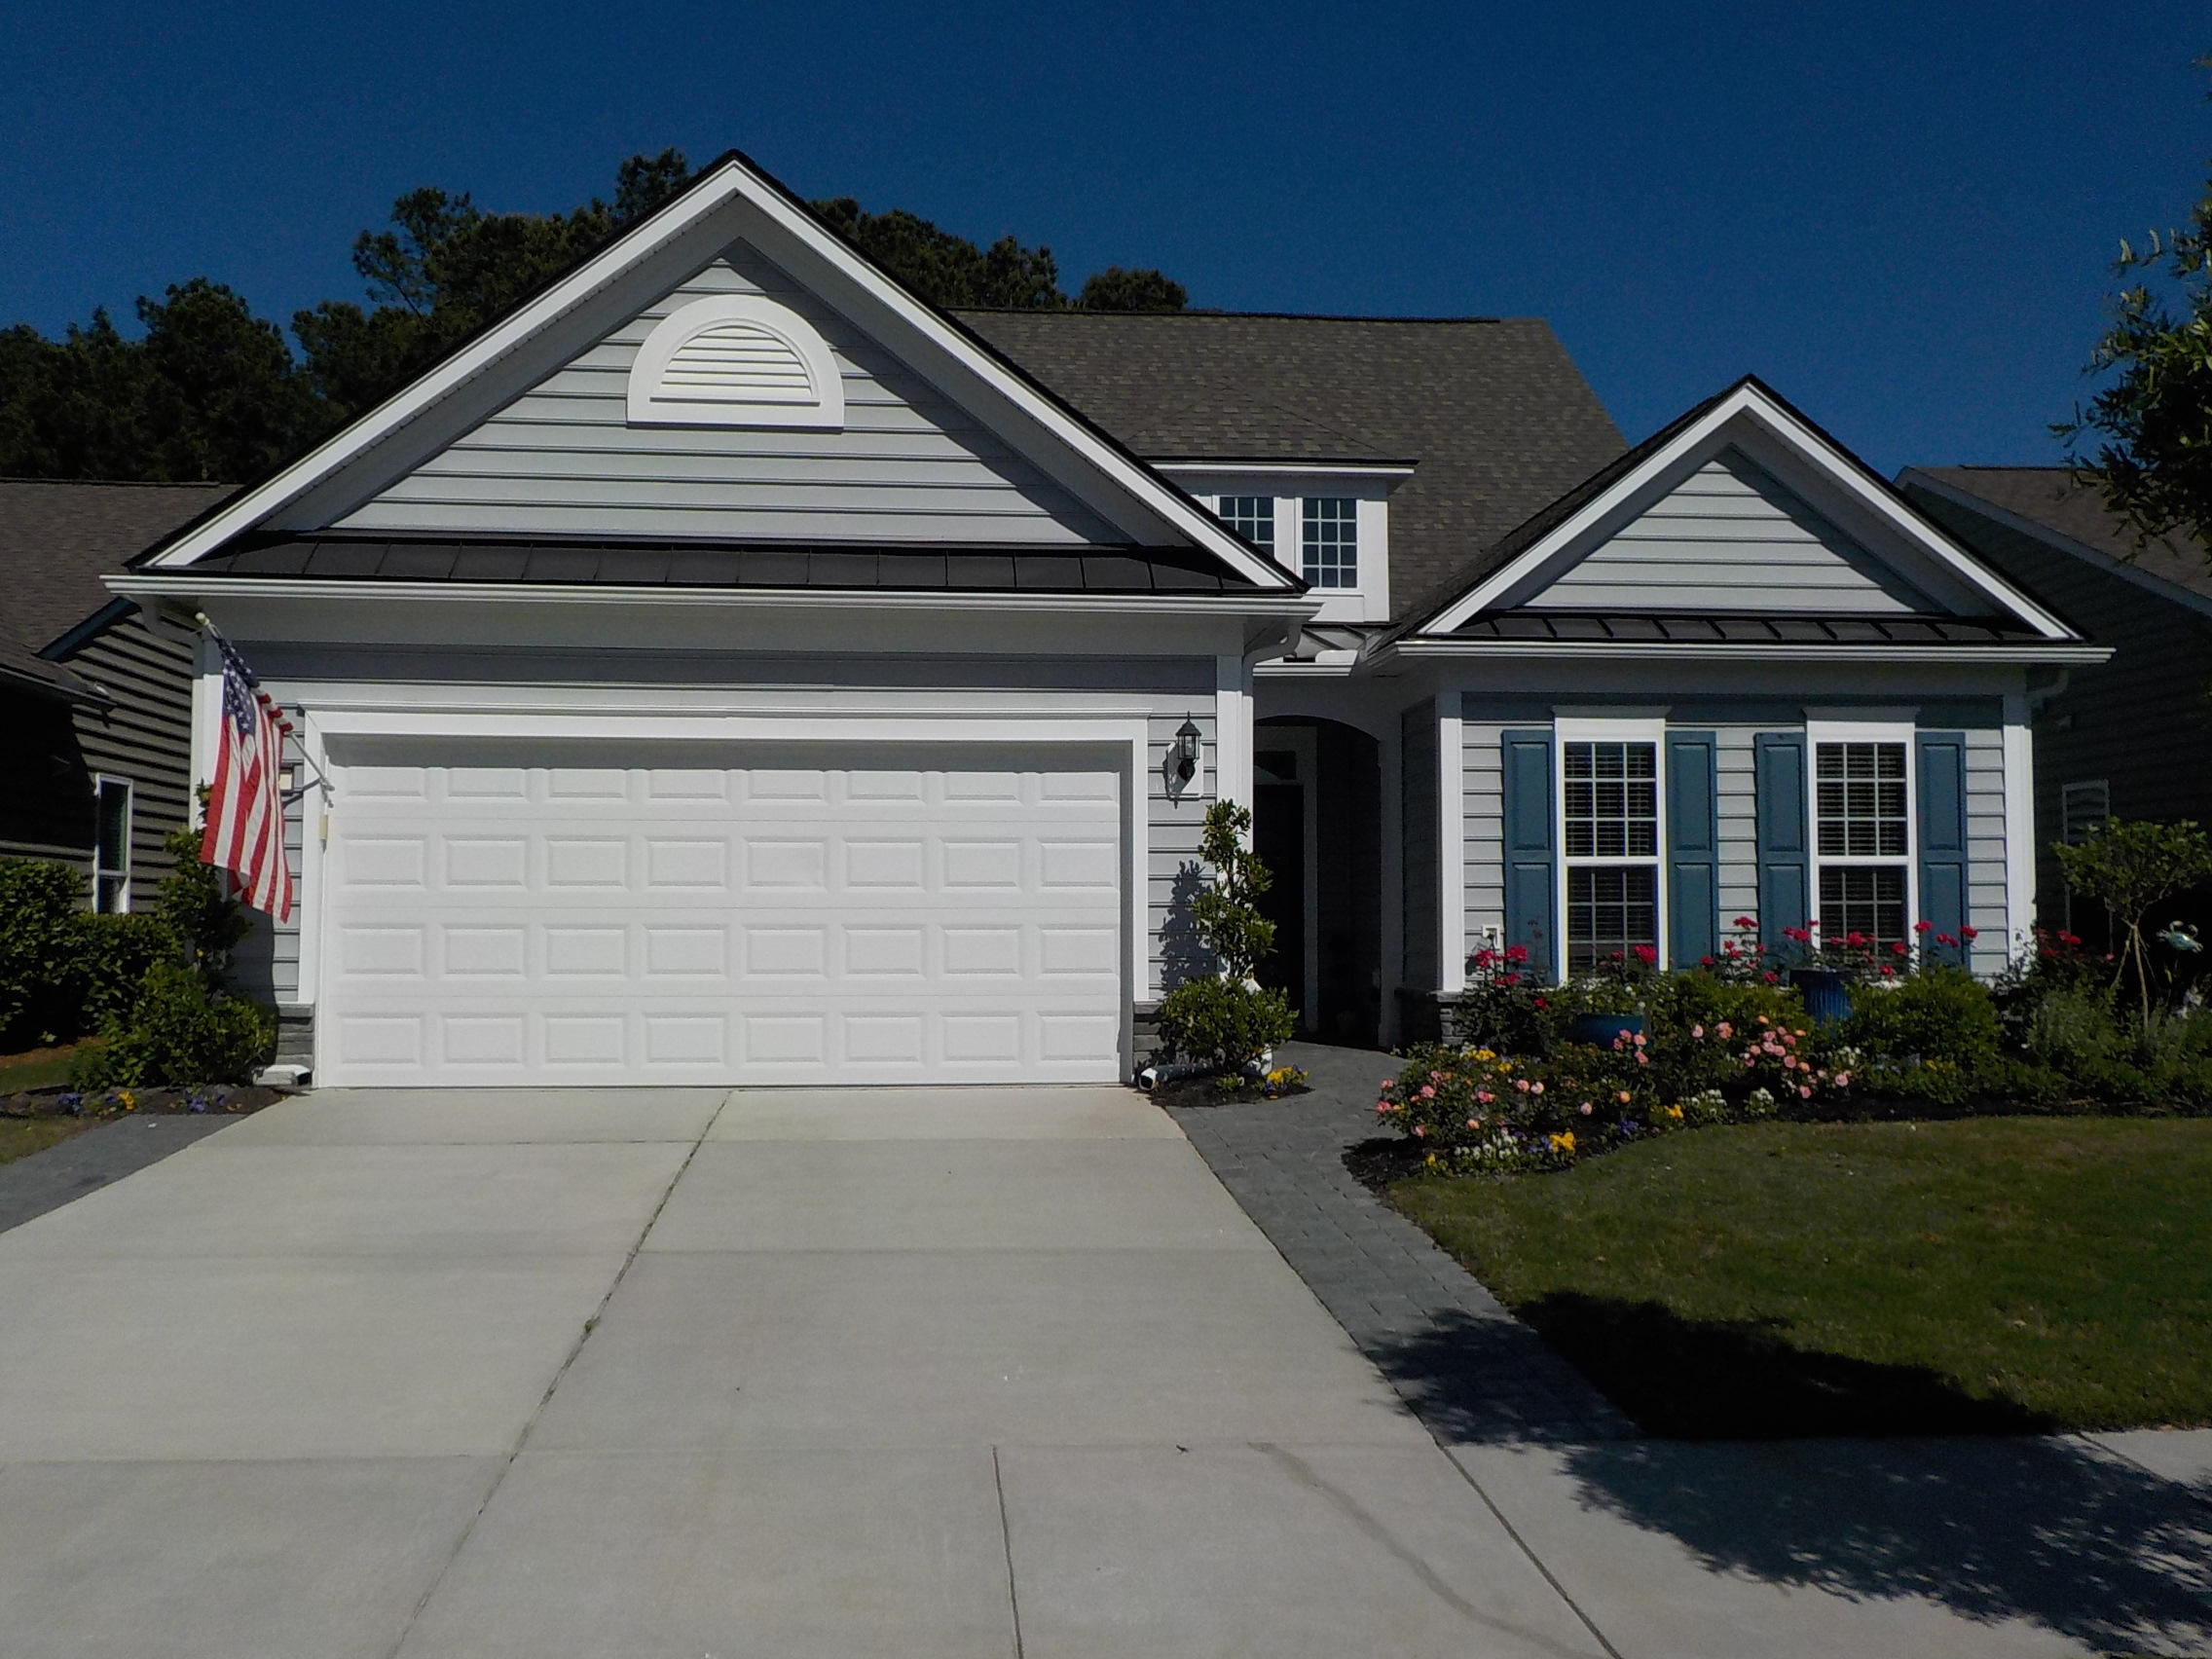 Cane Bay Plantation Homes For Sale - 419 Eastern Isle, Summerville, SC - 1